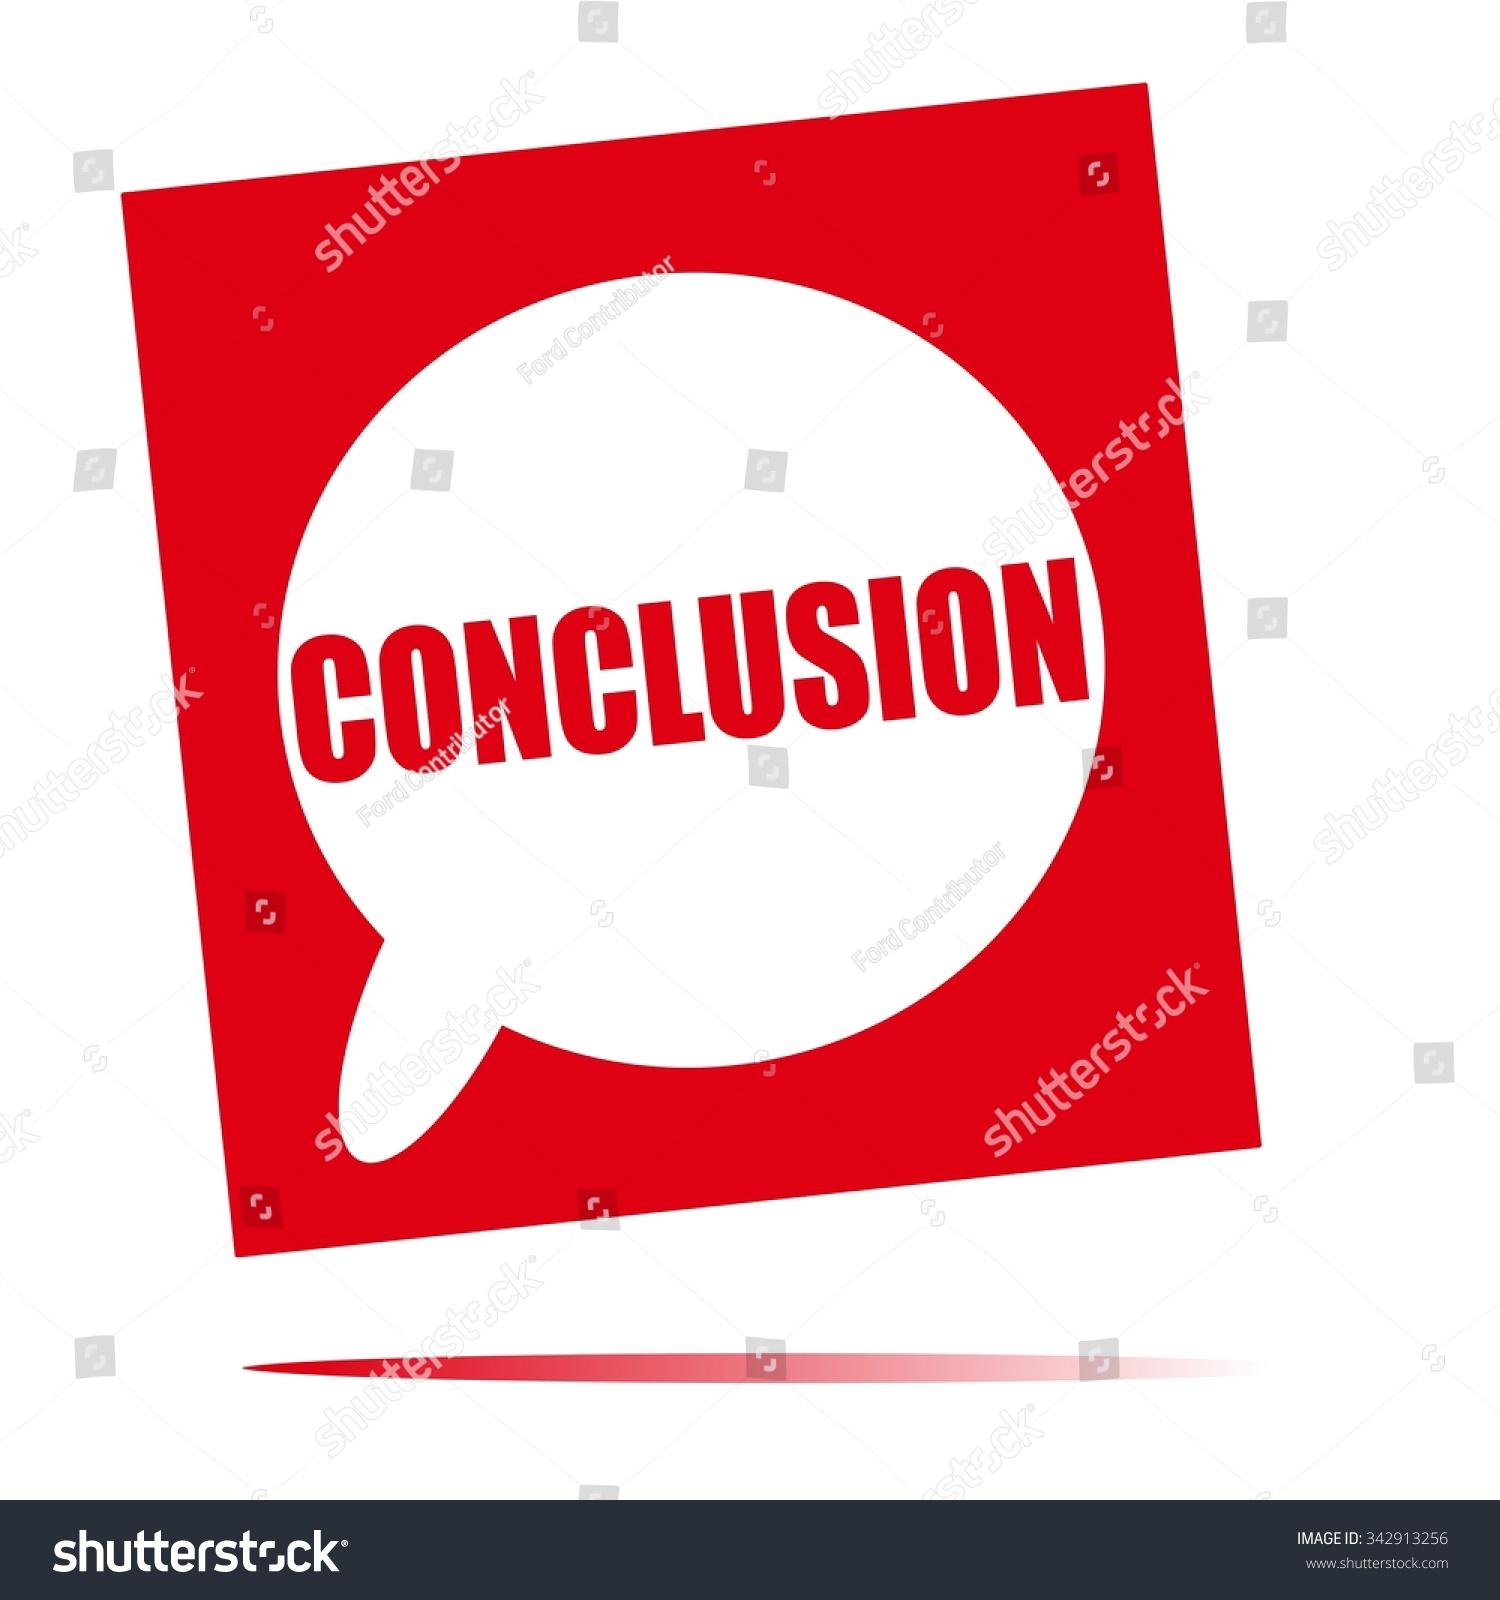 Conclusion Speech Bubble Icon Stock Illustration 342913256 ...